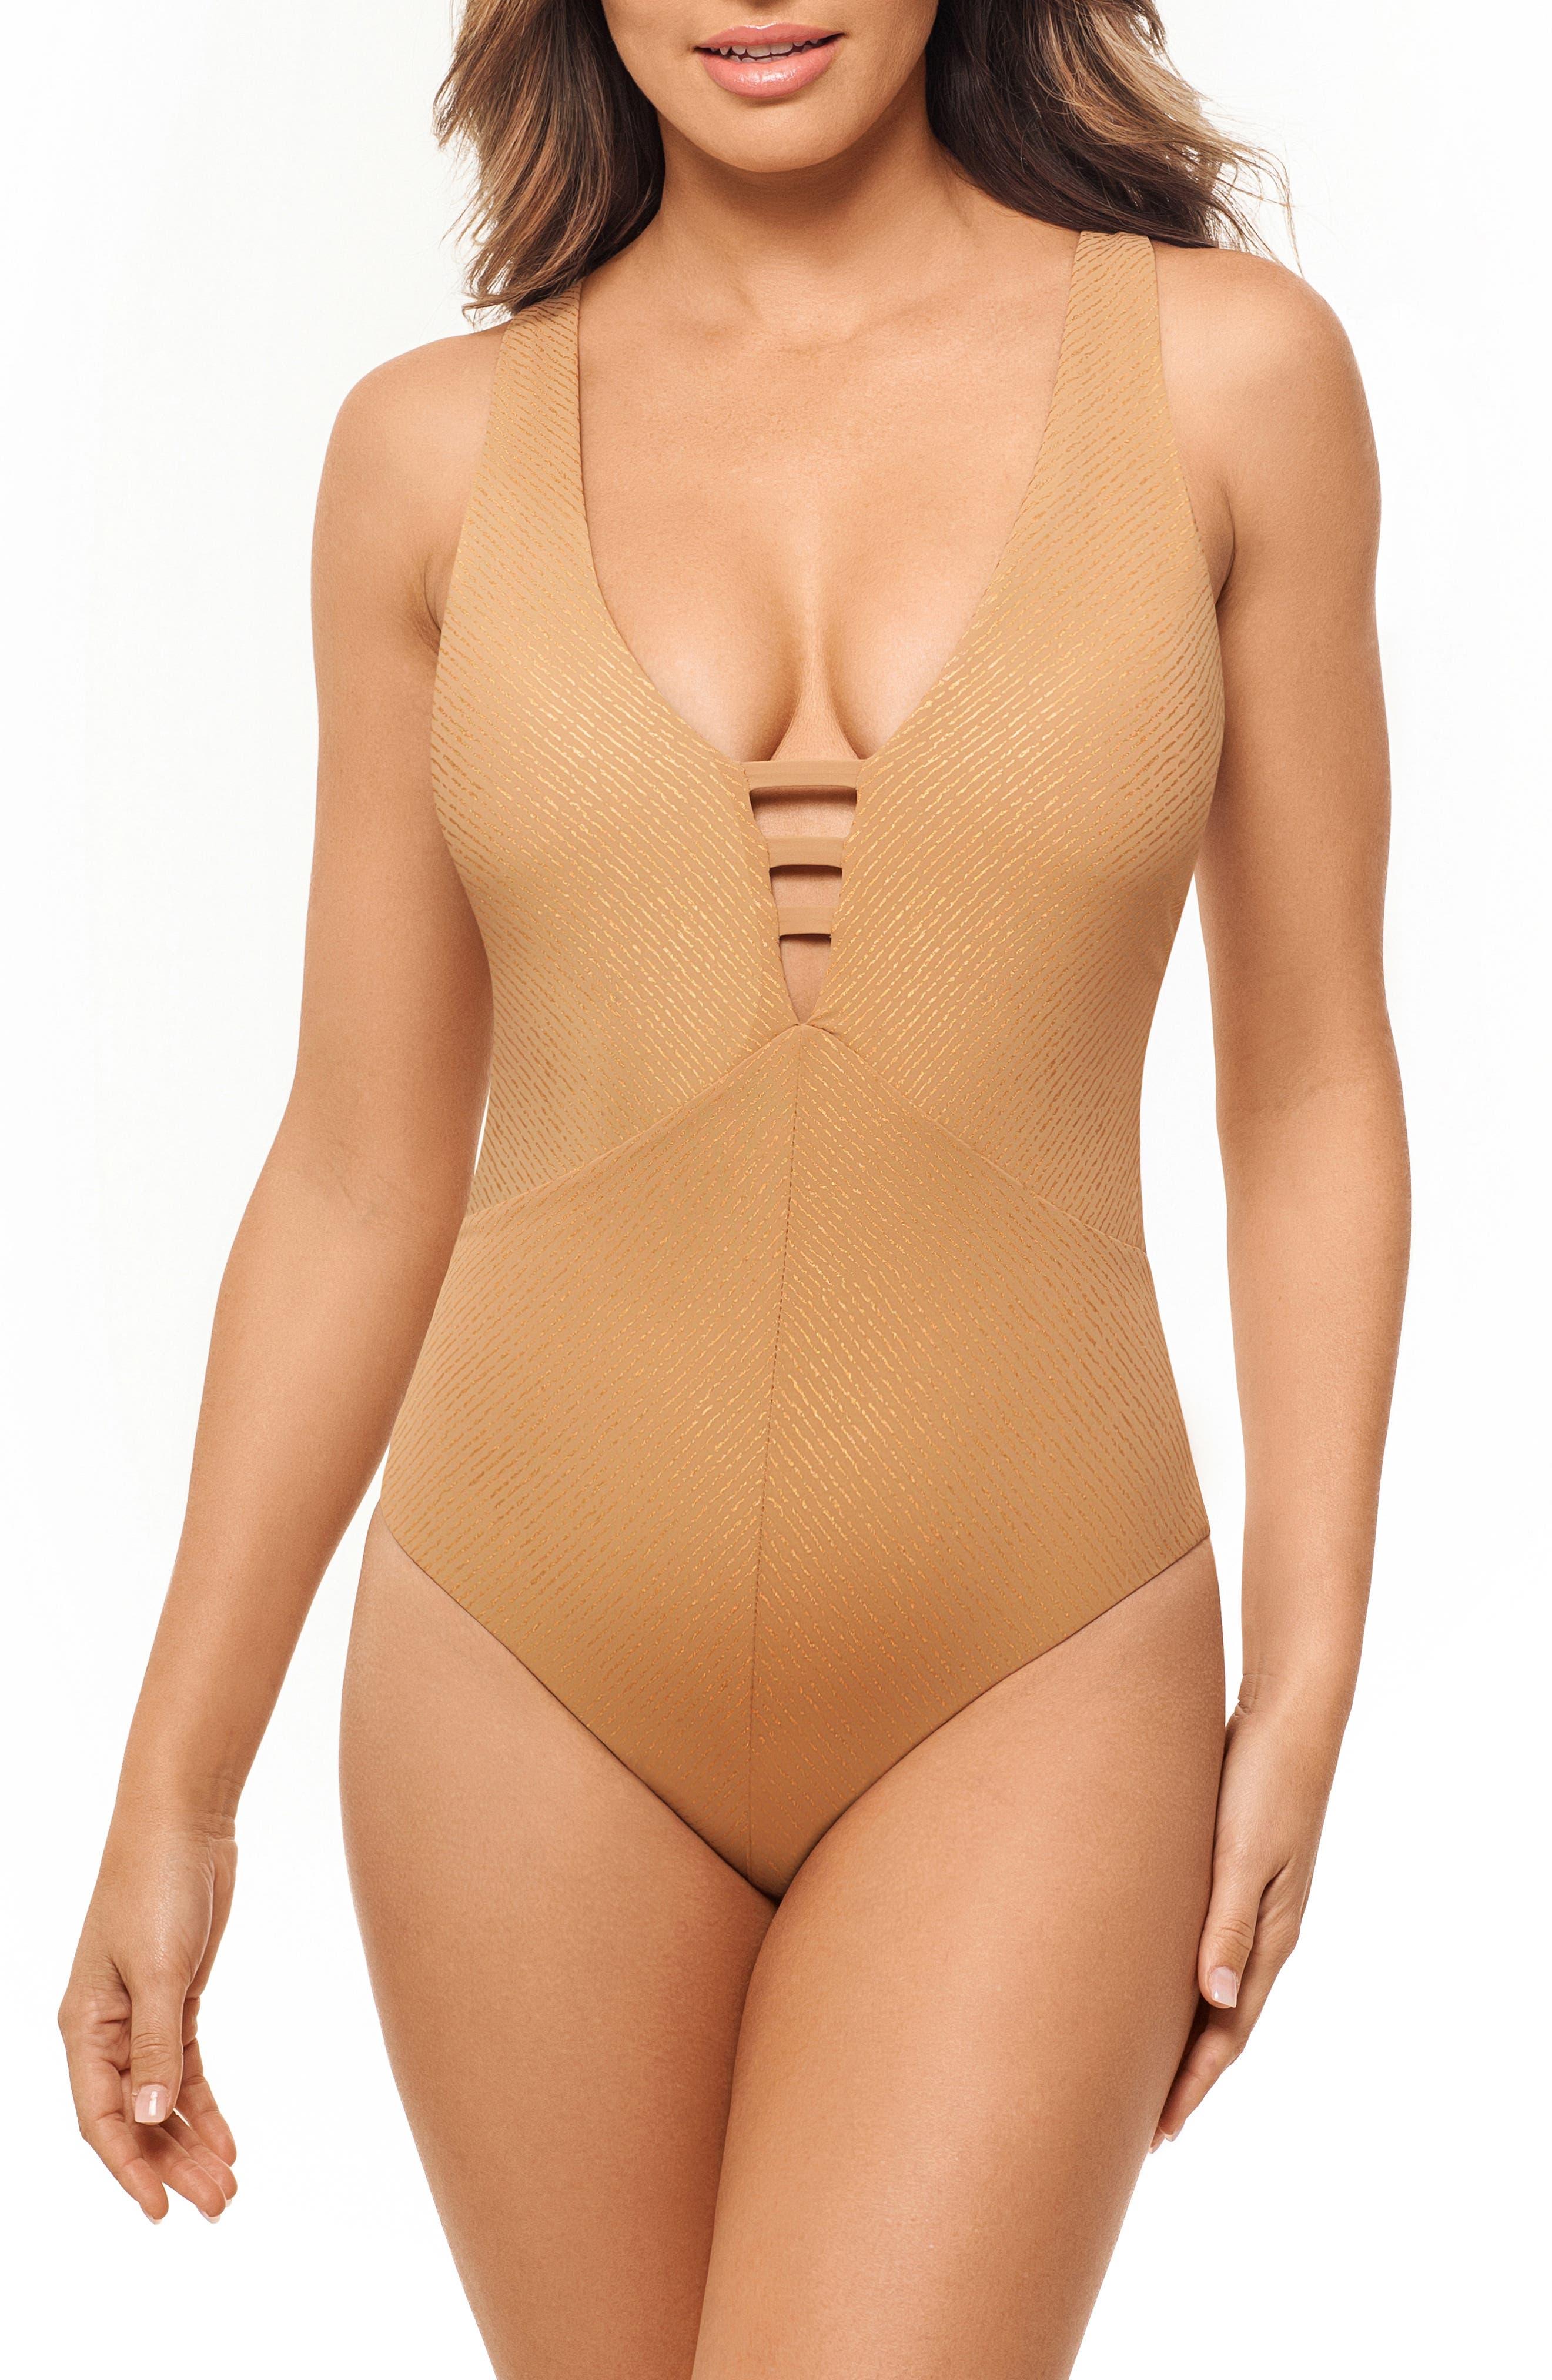 Sanskrit Victoria One-Piece Swimsuit